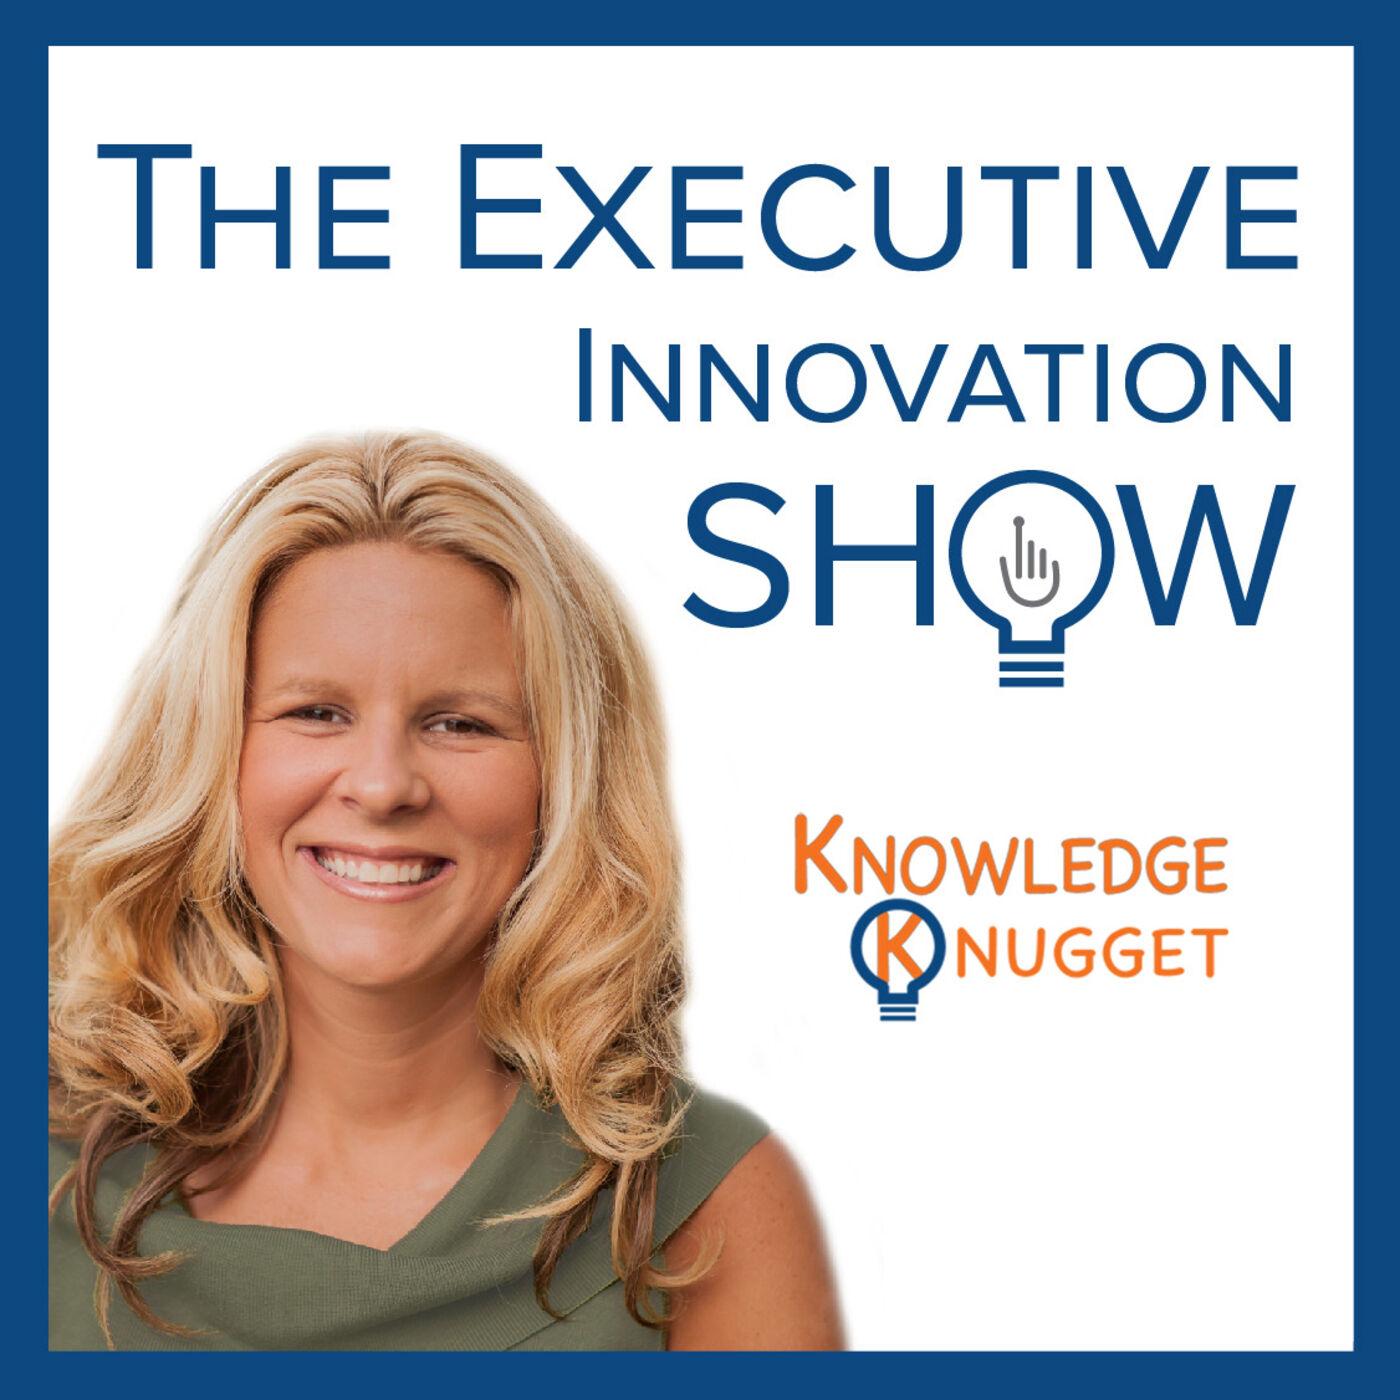 Knowledge Knugget: HIPAA Waiver, Telehealth Waiver: What's Next